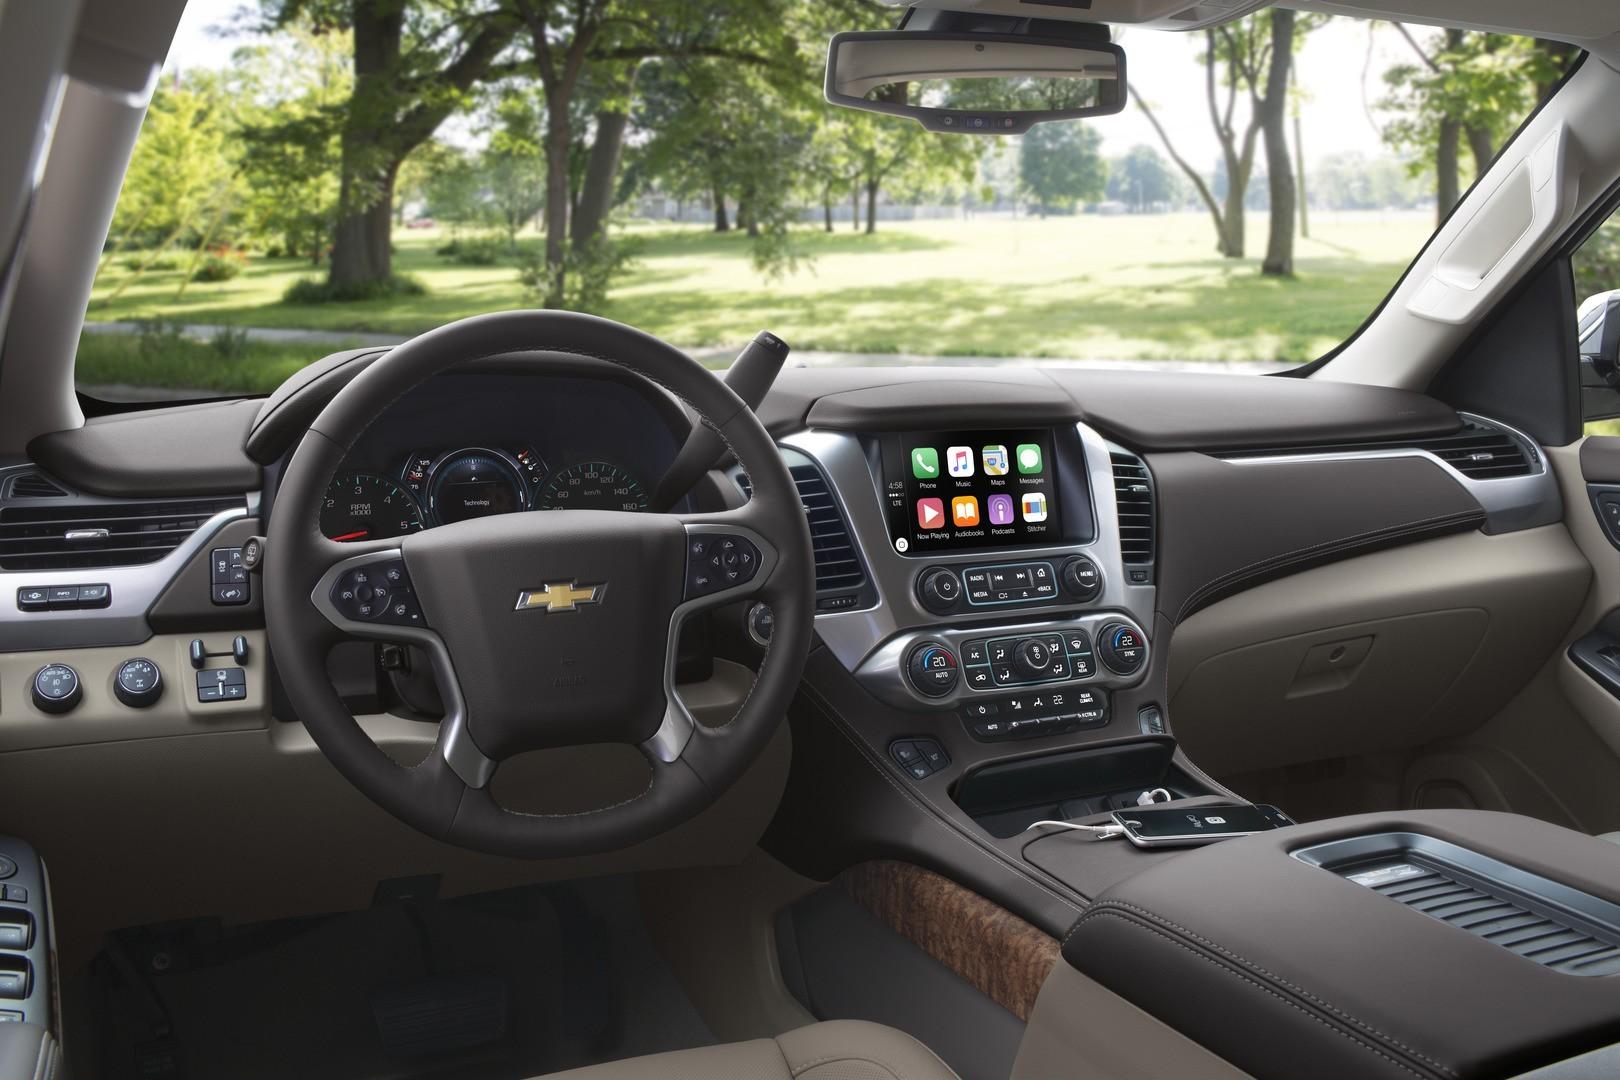 Chevrolet-Tahoe-2016-16CHTA35017-CDN-ENG-V3